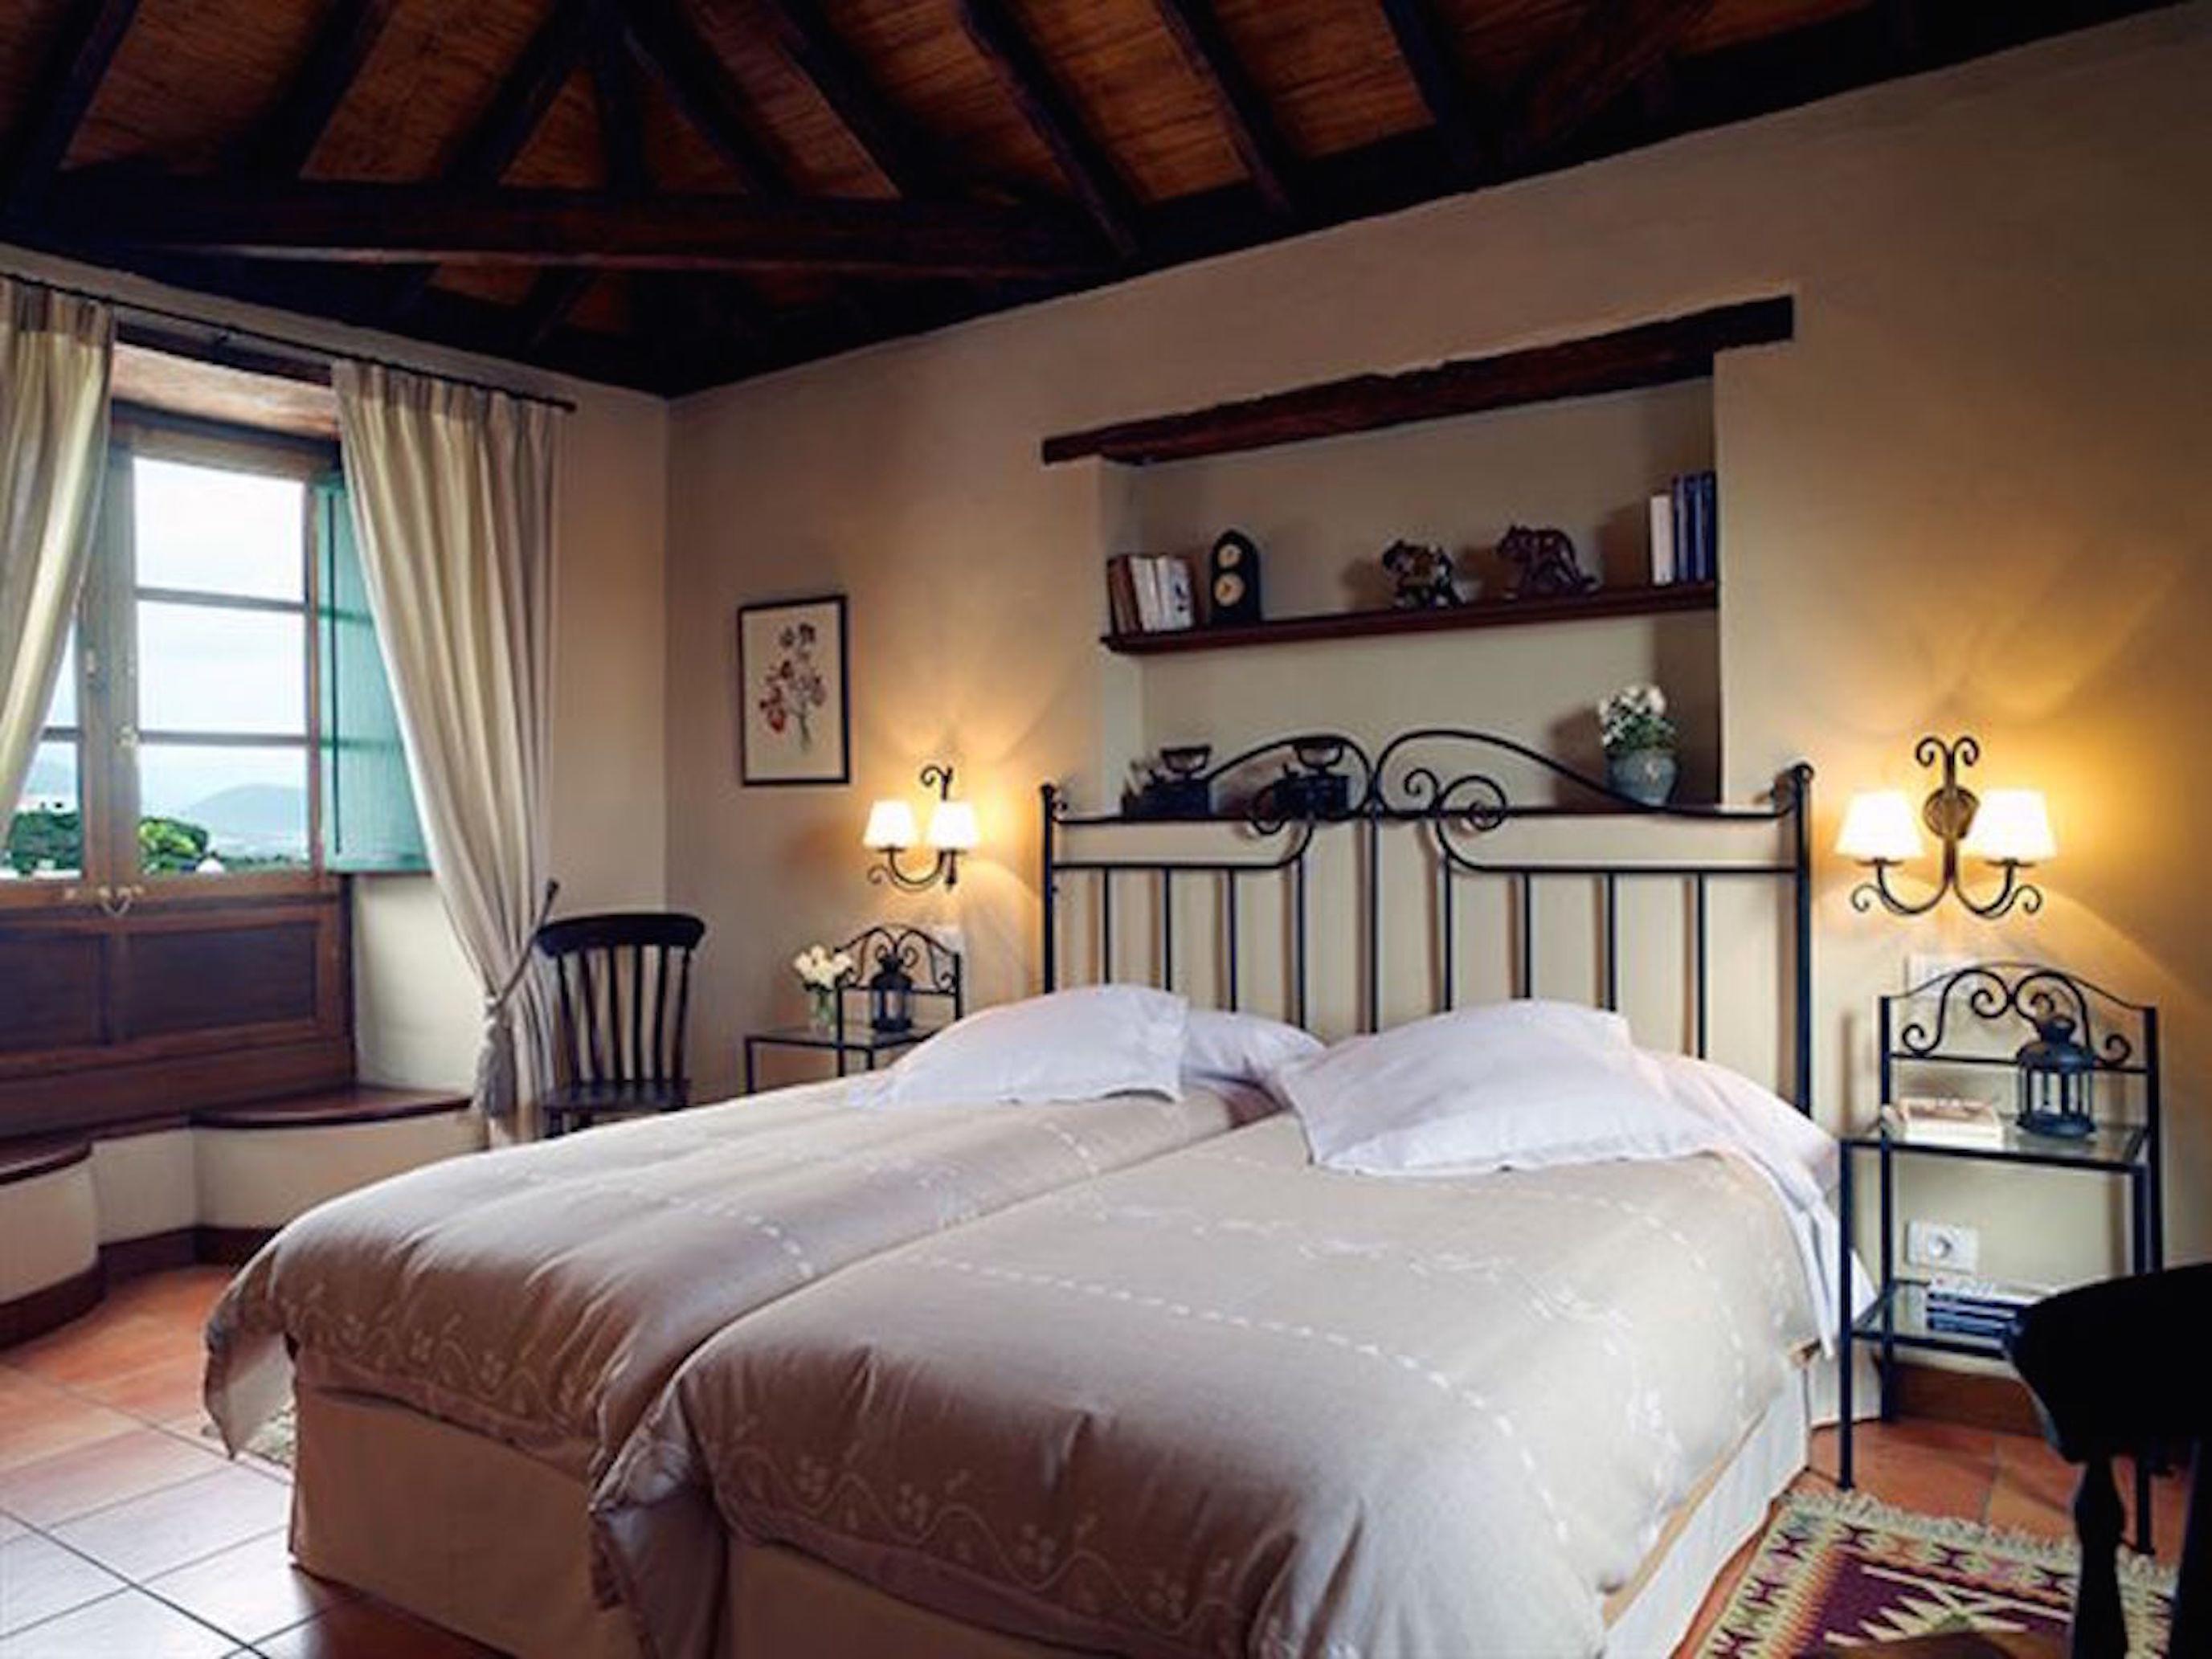 Maison de vacances La Hacienda, Free Wifi Grill (2196689), Garachico, Ténérife, Iles Canaries, Espagne, image 25